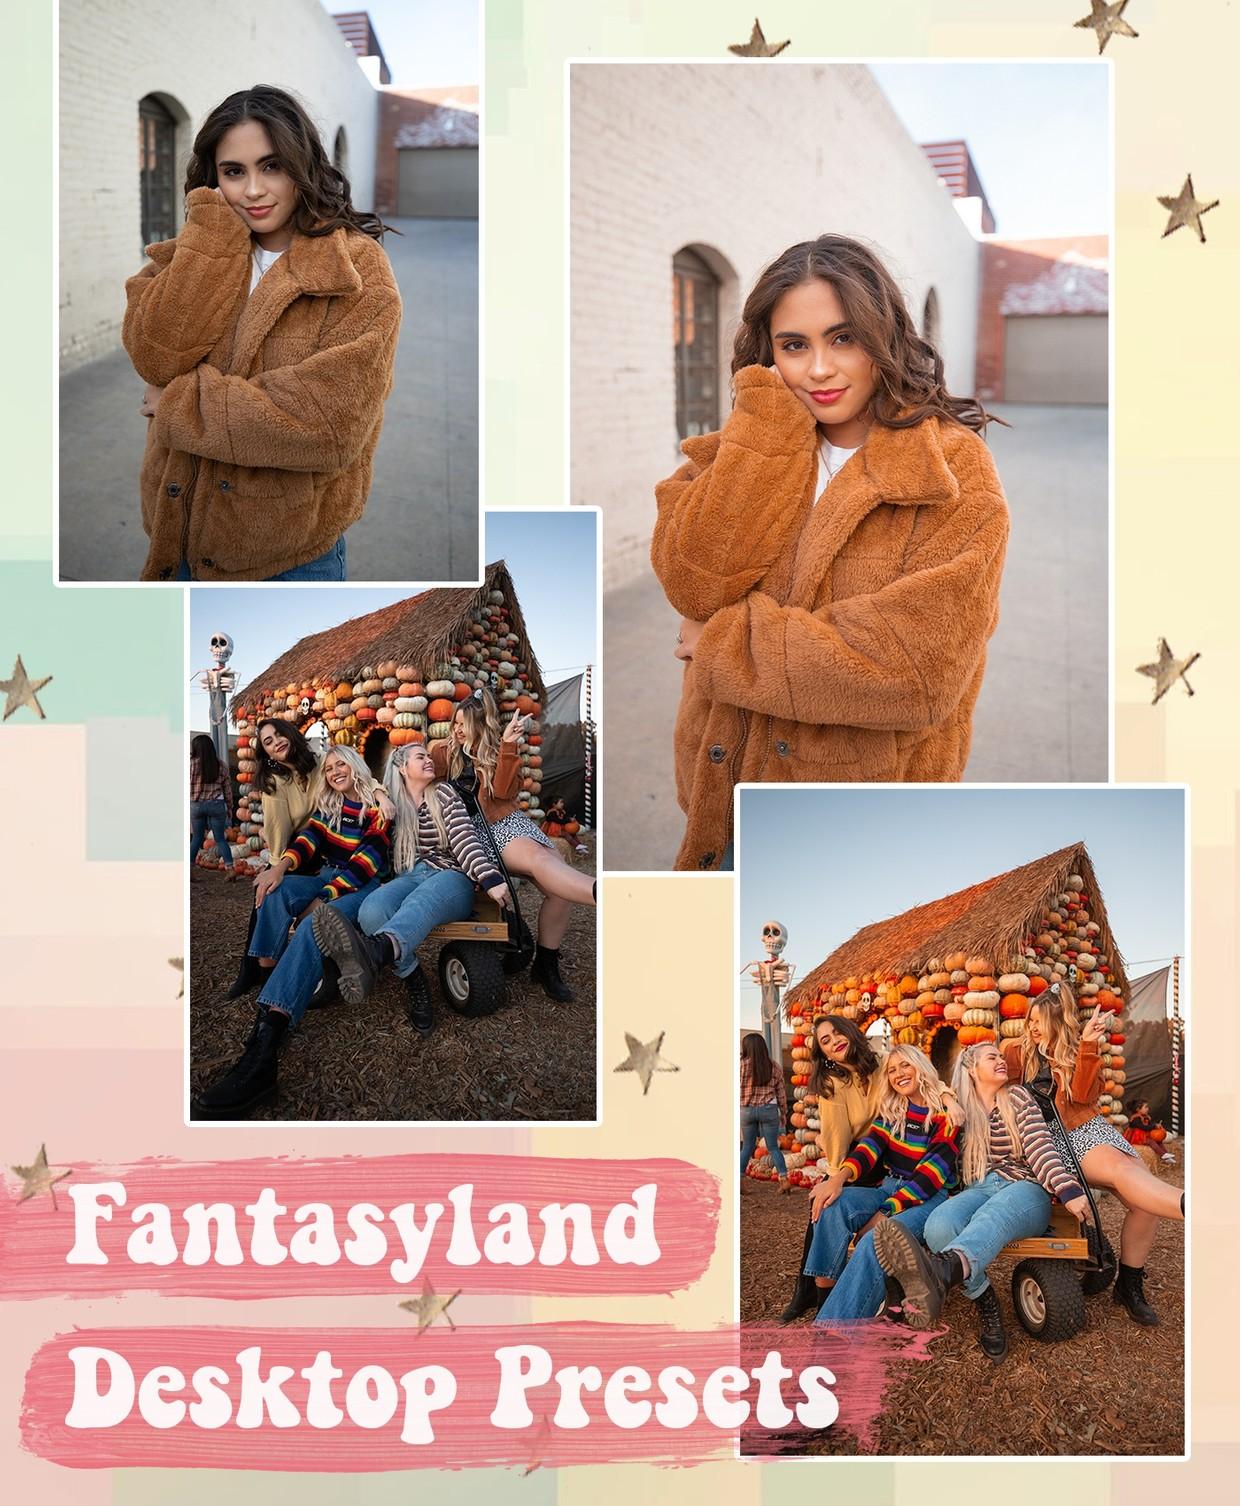 Fantasyland Preset Pack - DESKTOP #JessPresets